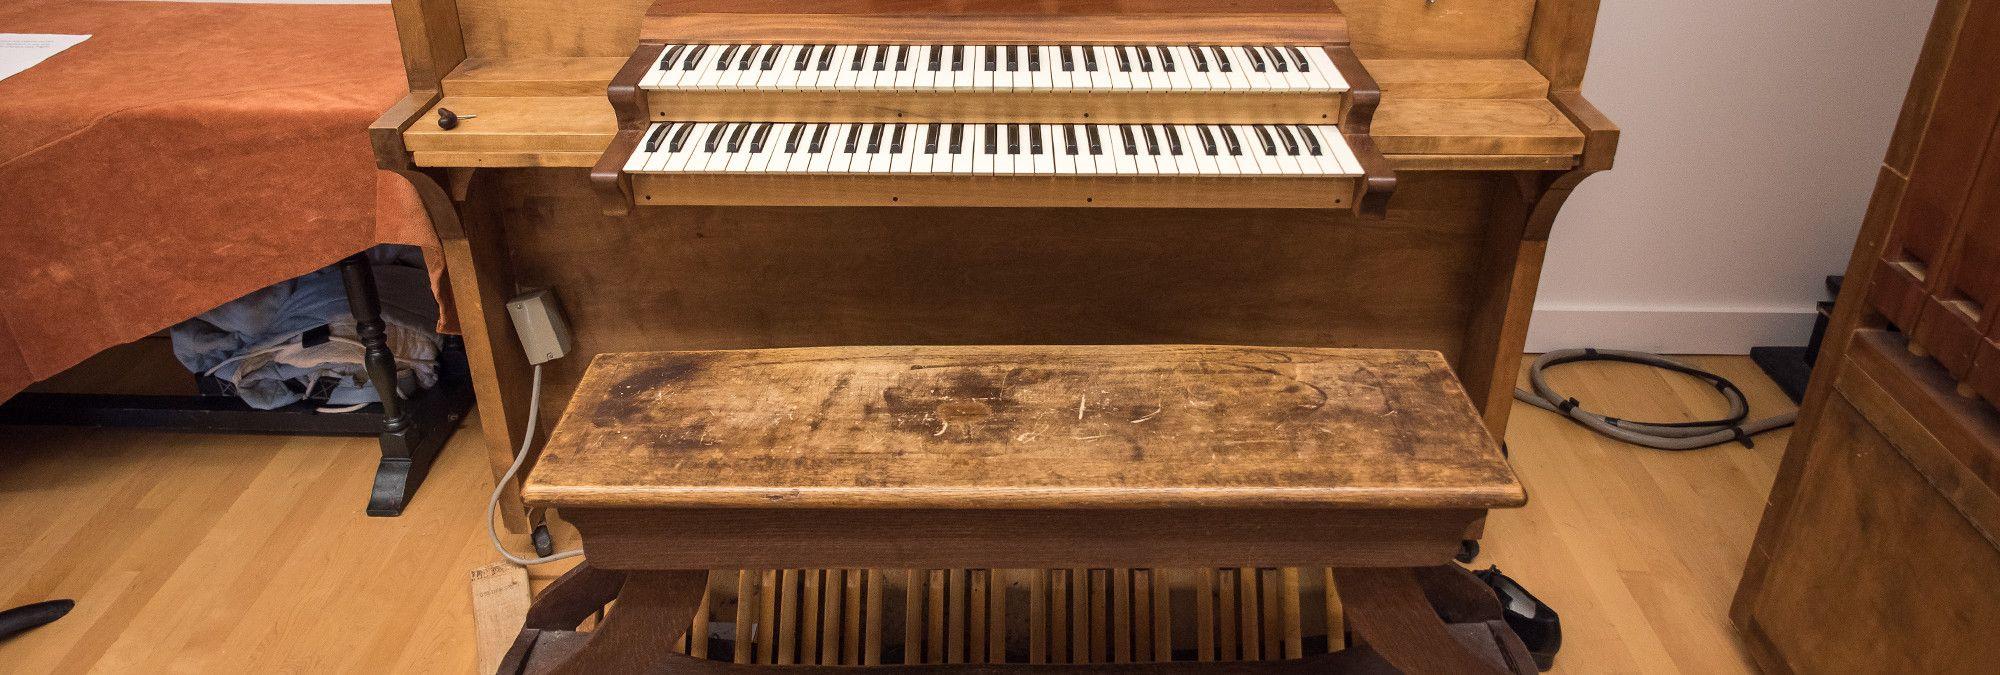 Keyboards, Organ, SFCM Degrees and Programs